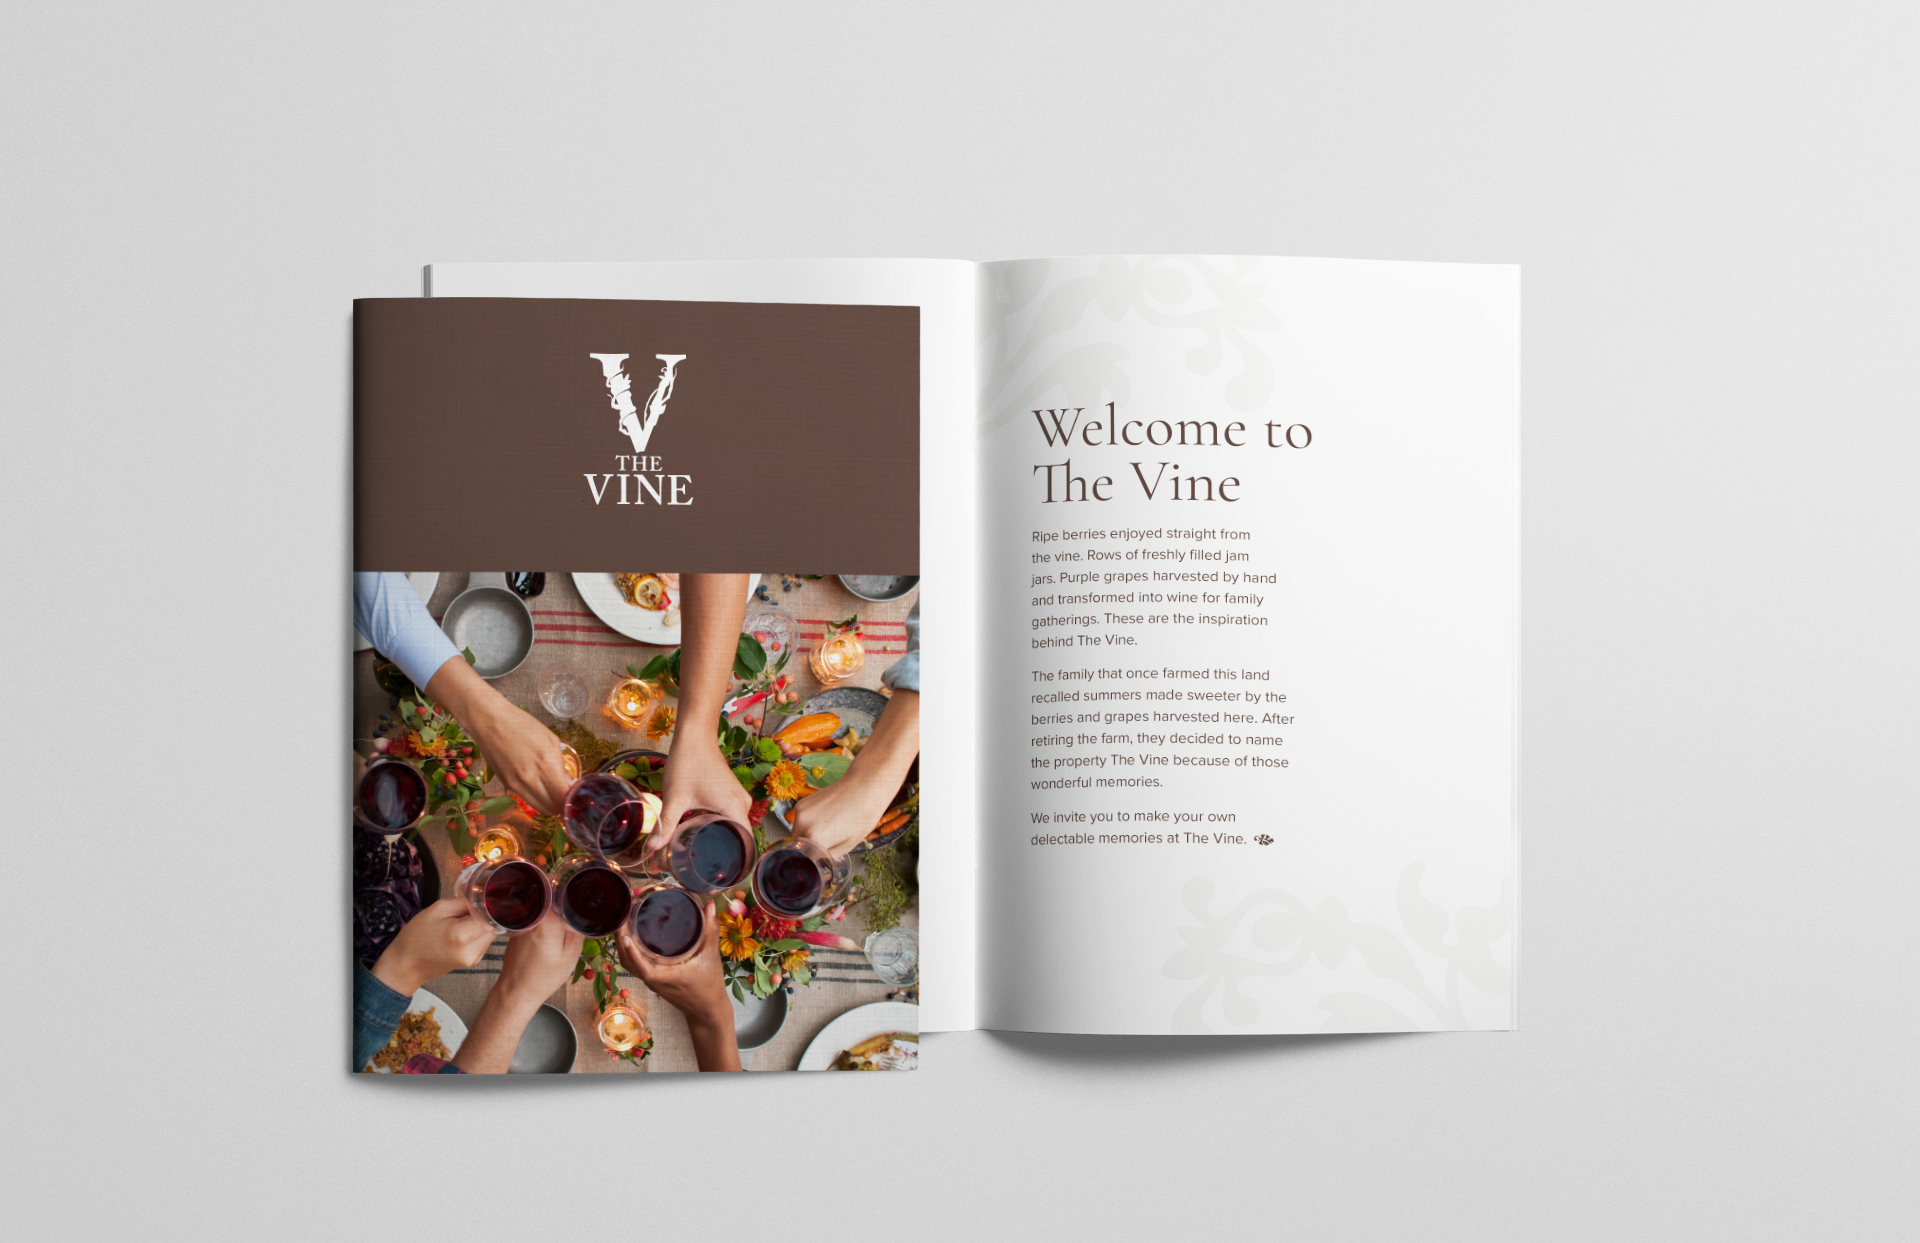 TheVine_brochure_spread_01.jpg